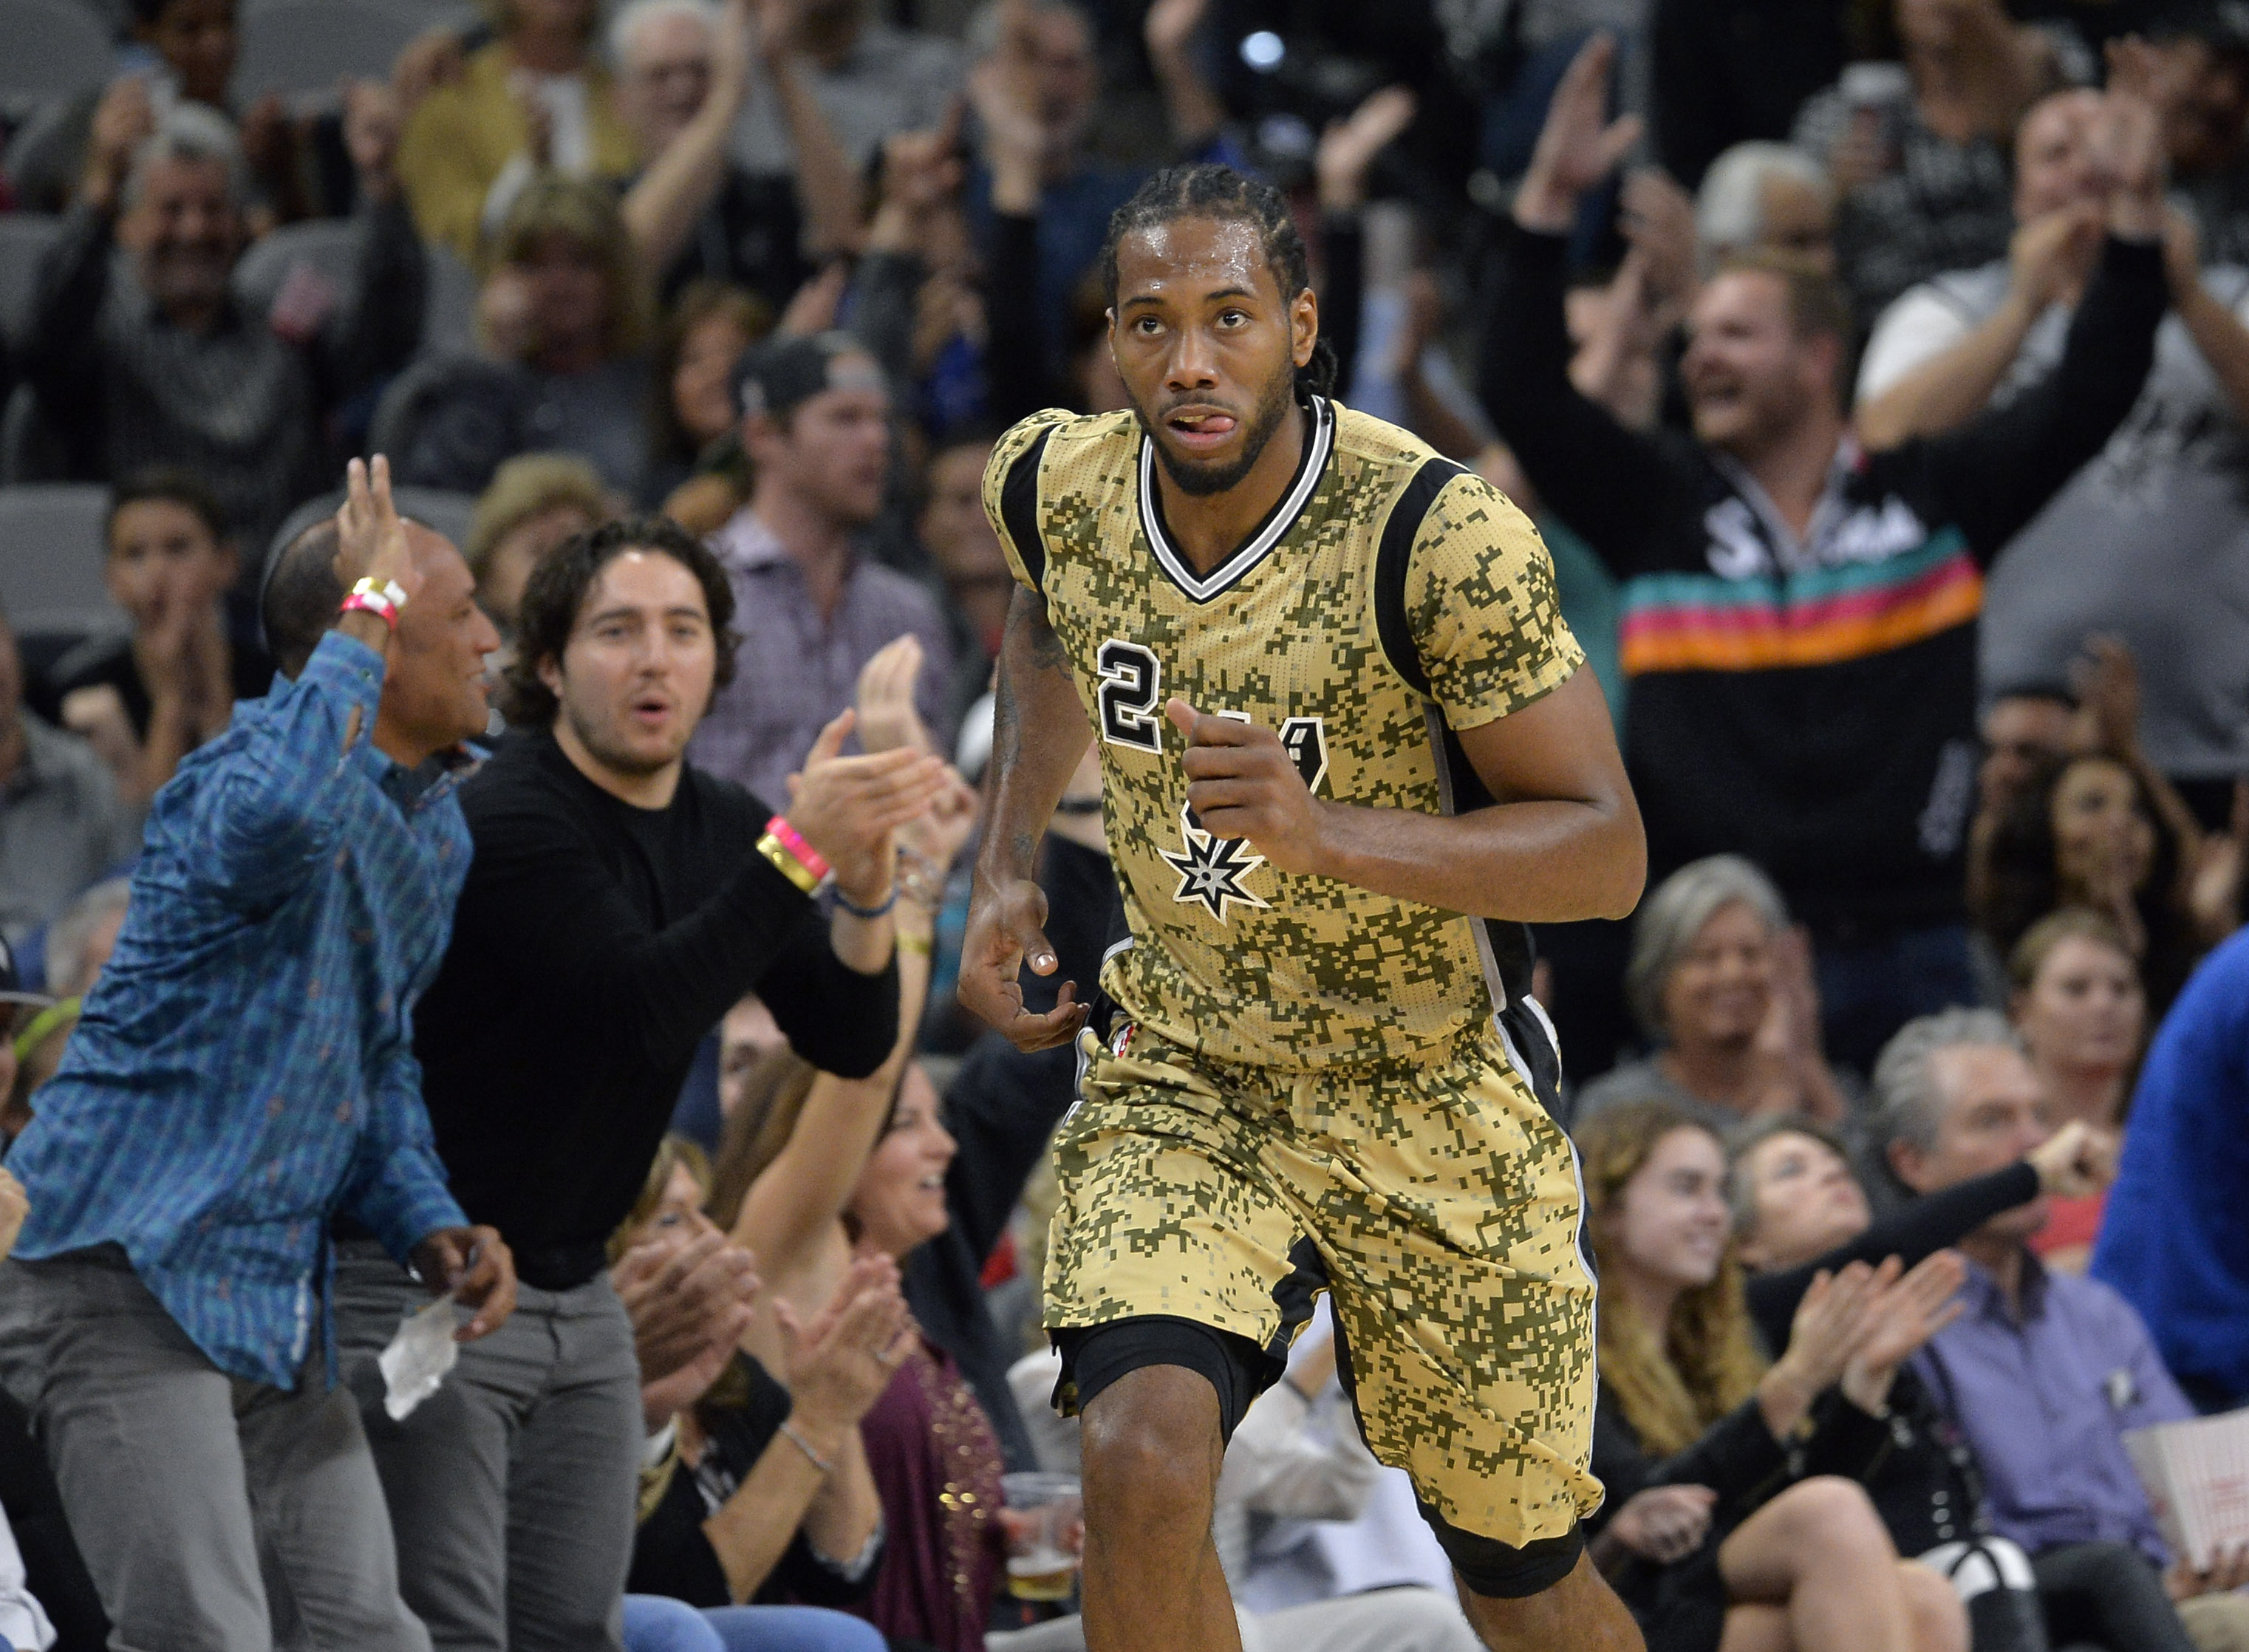 San Antonio Spurs forward Kawhi Leonard runs up court after scoring a basket during the first half of an NBA basketball game against the Charlotte Hornets, Saturday, Nov. 7, 2015, in San Antonio. (AP Photo/Darren Abate)